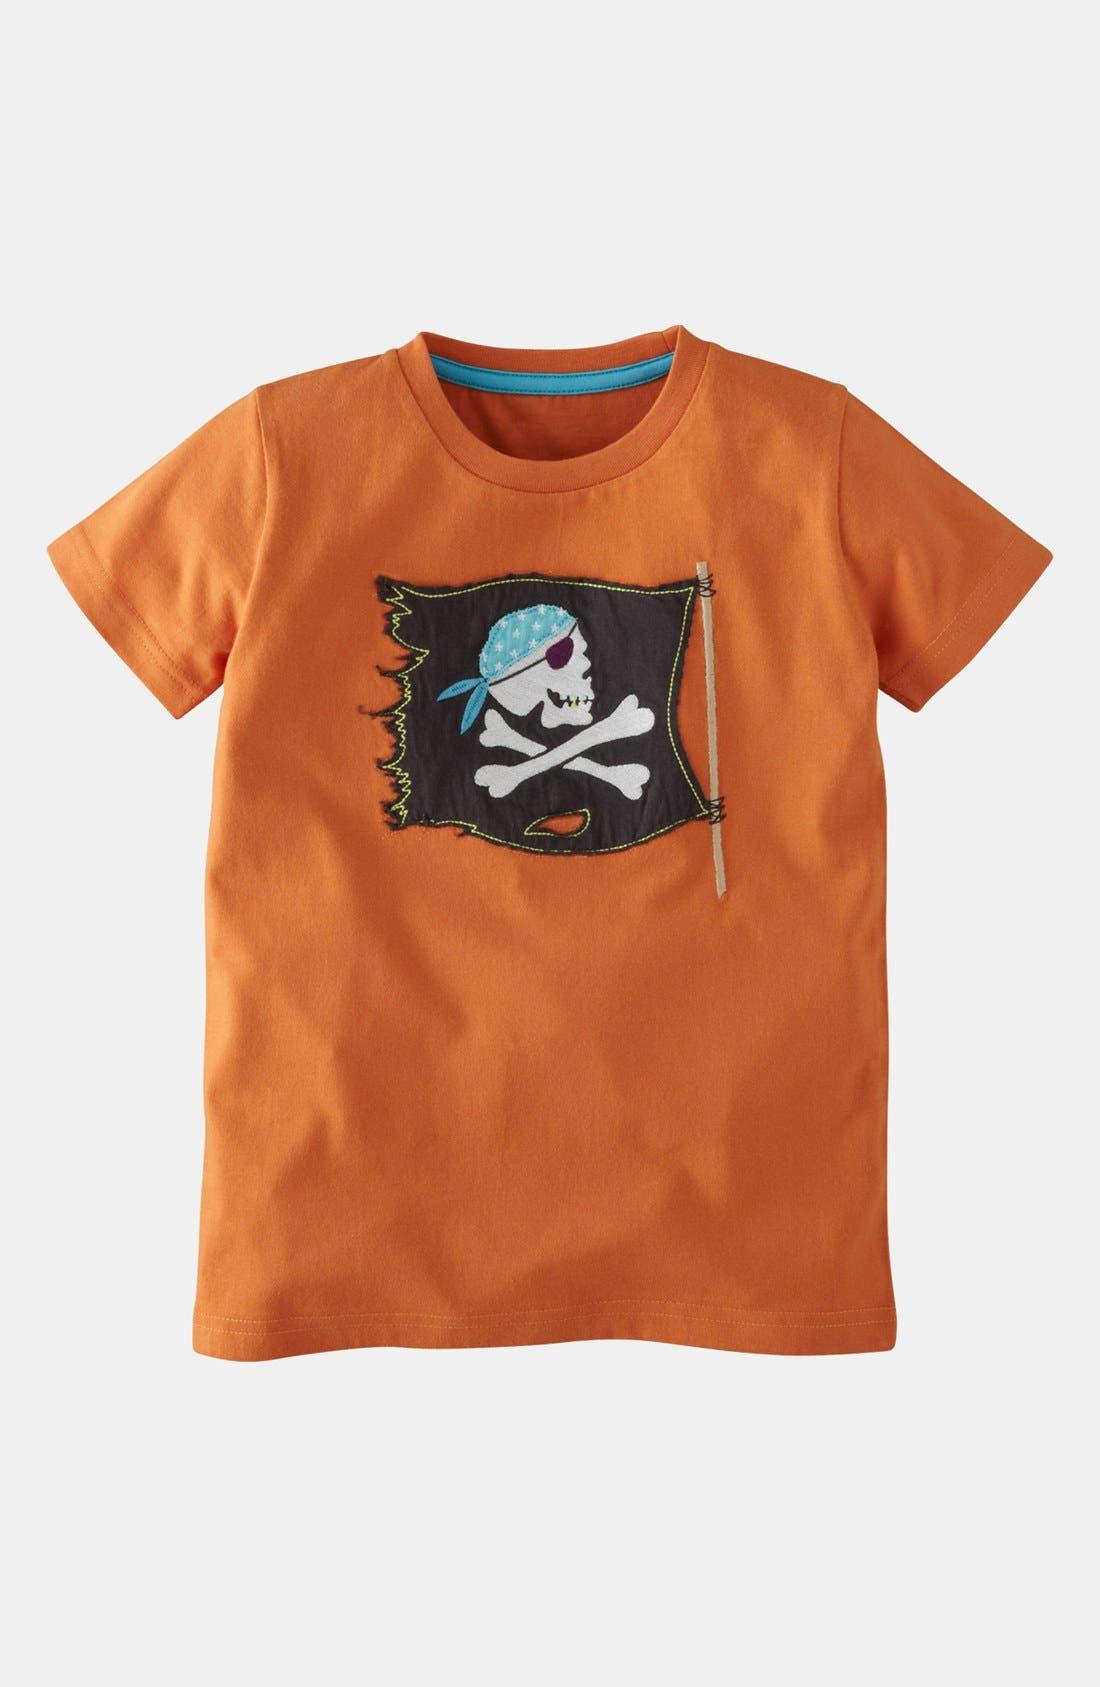 Main Image - Mini Boden T-Shirt & Shorts (Toddler, Little Boys & Big Boys)